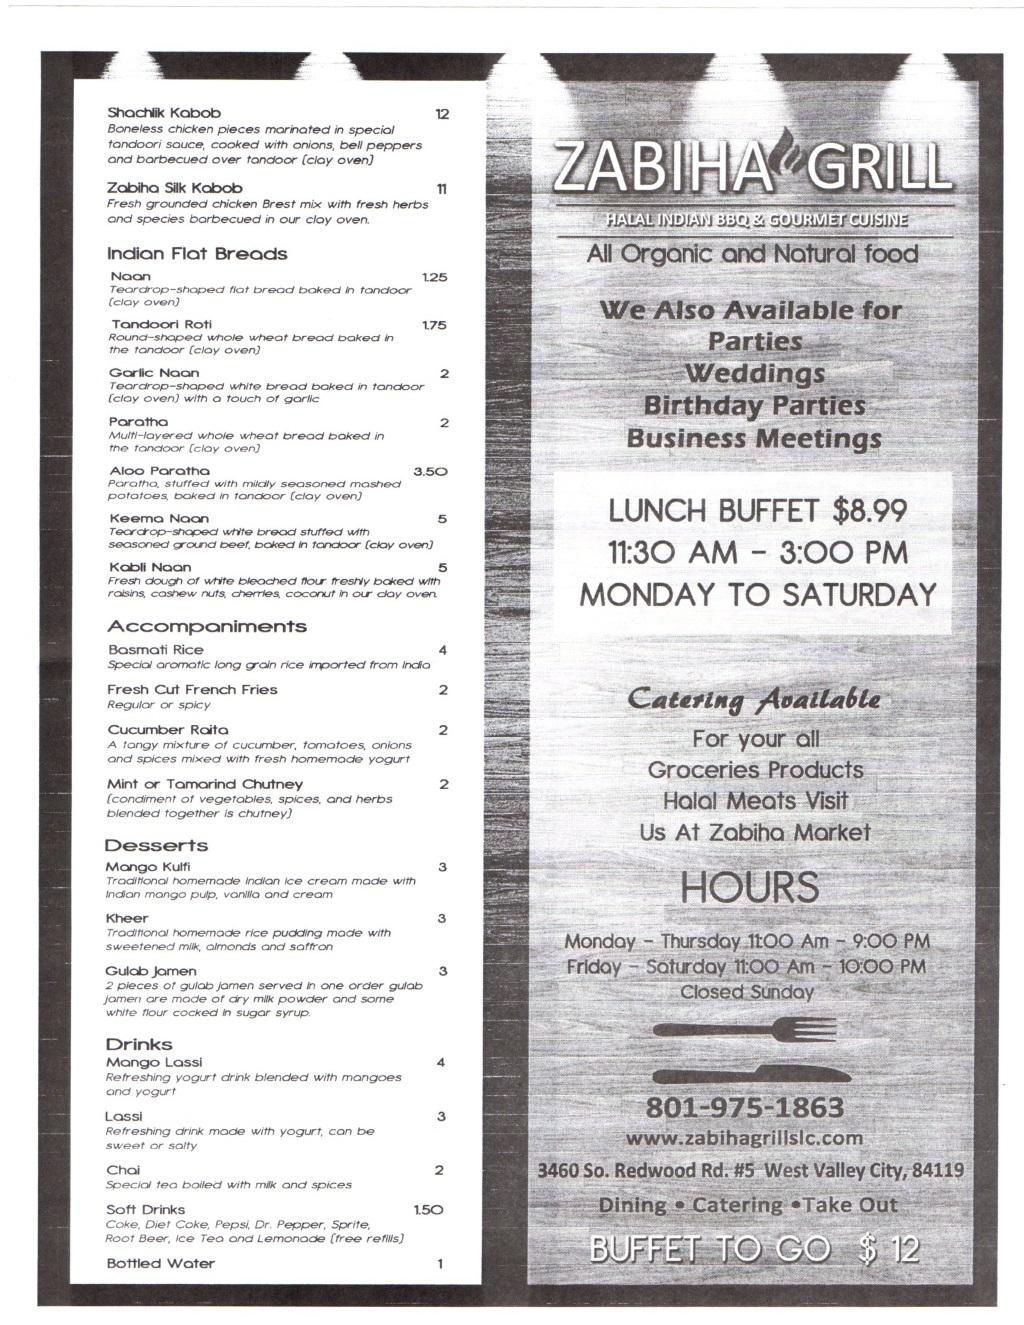 zabiha grill menu february 2015 page two